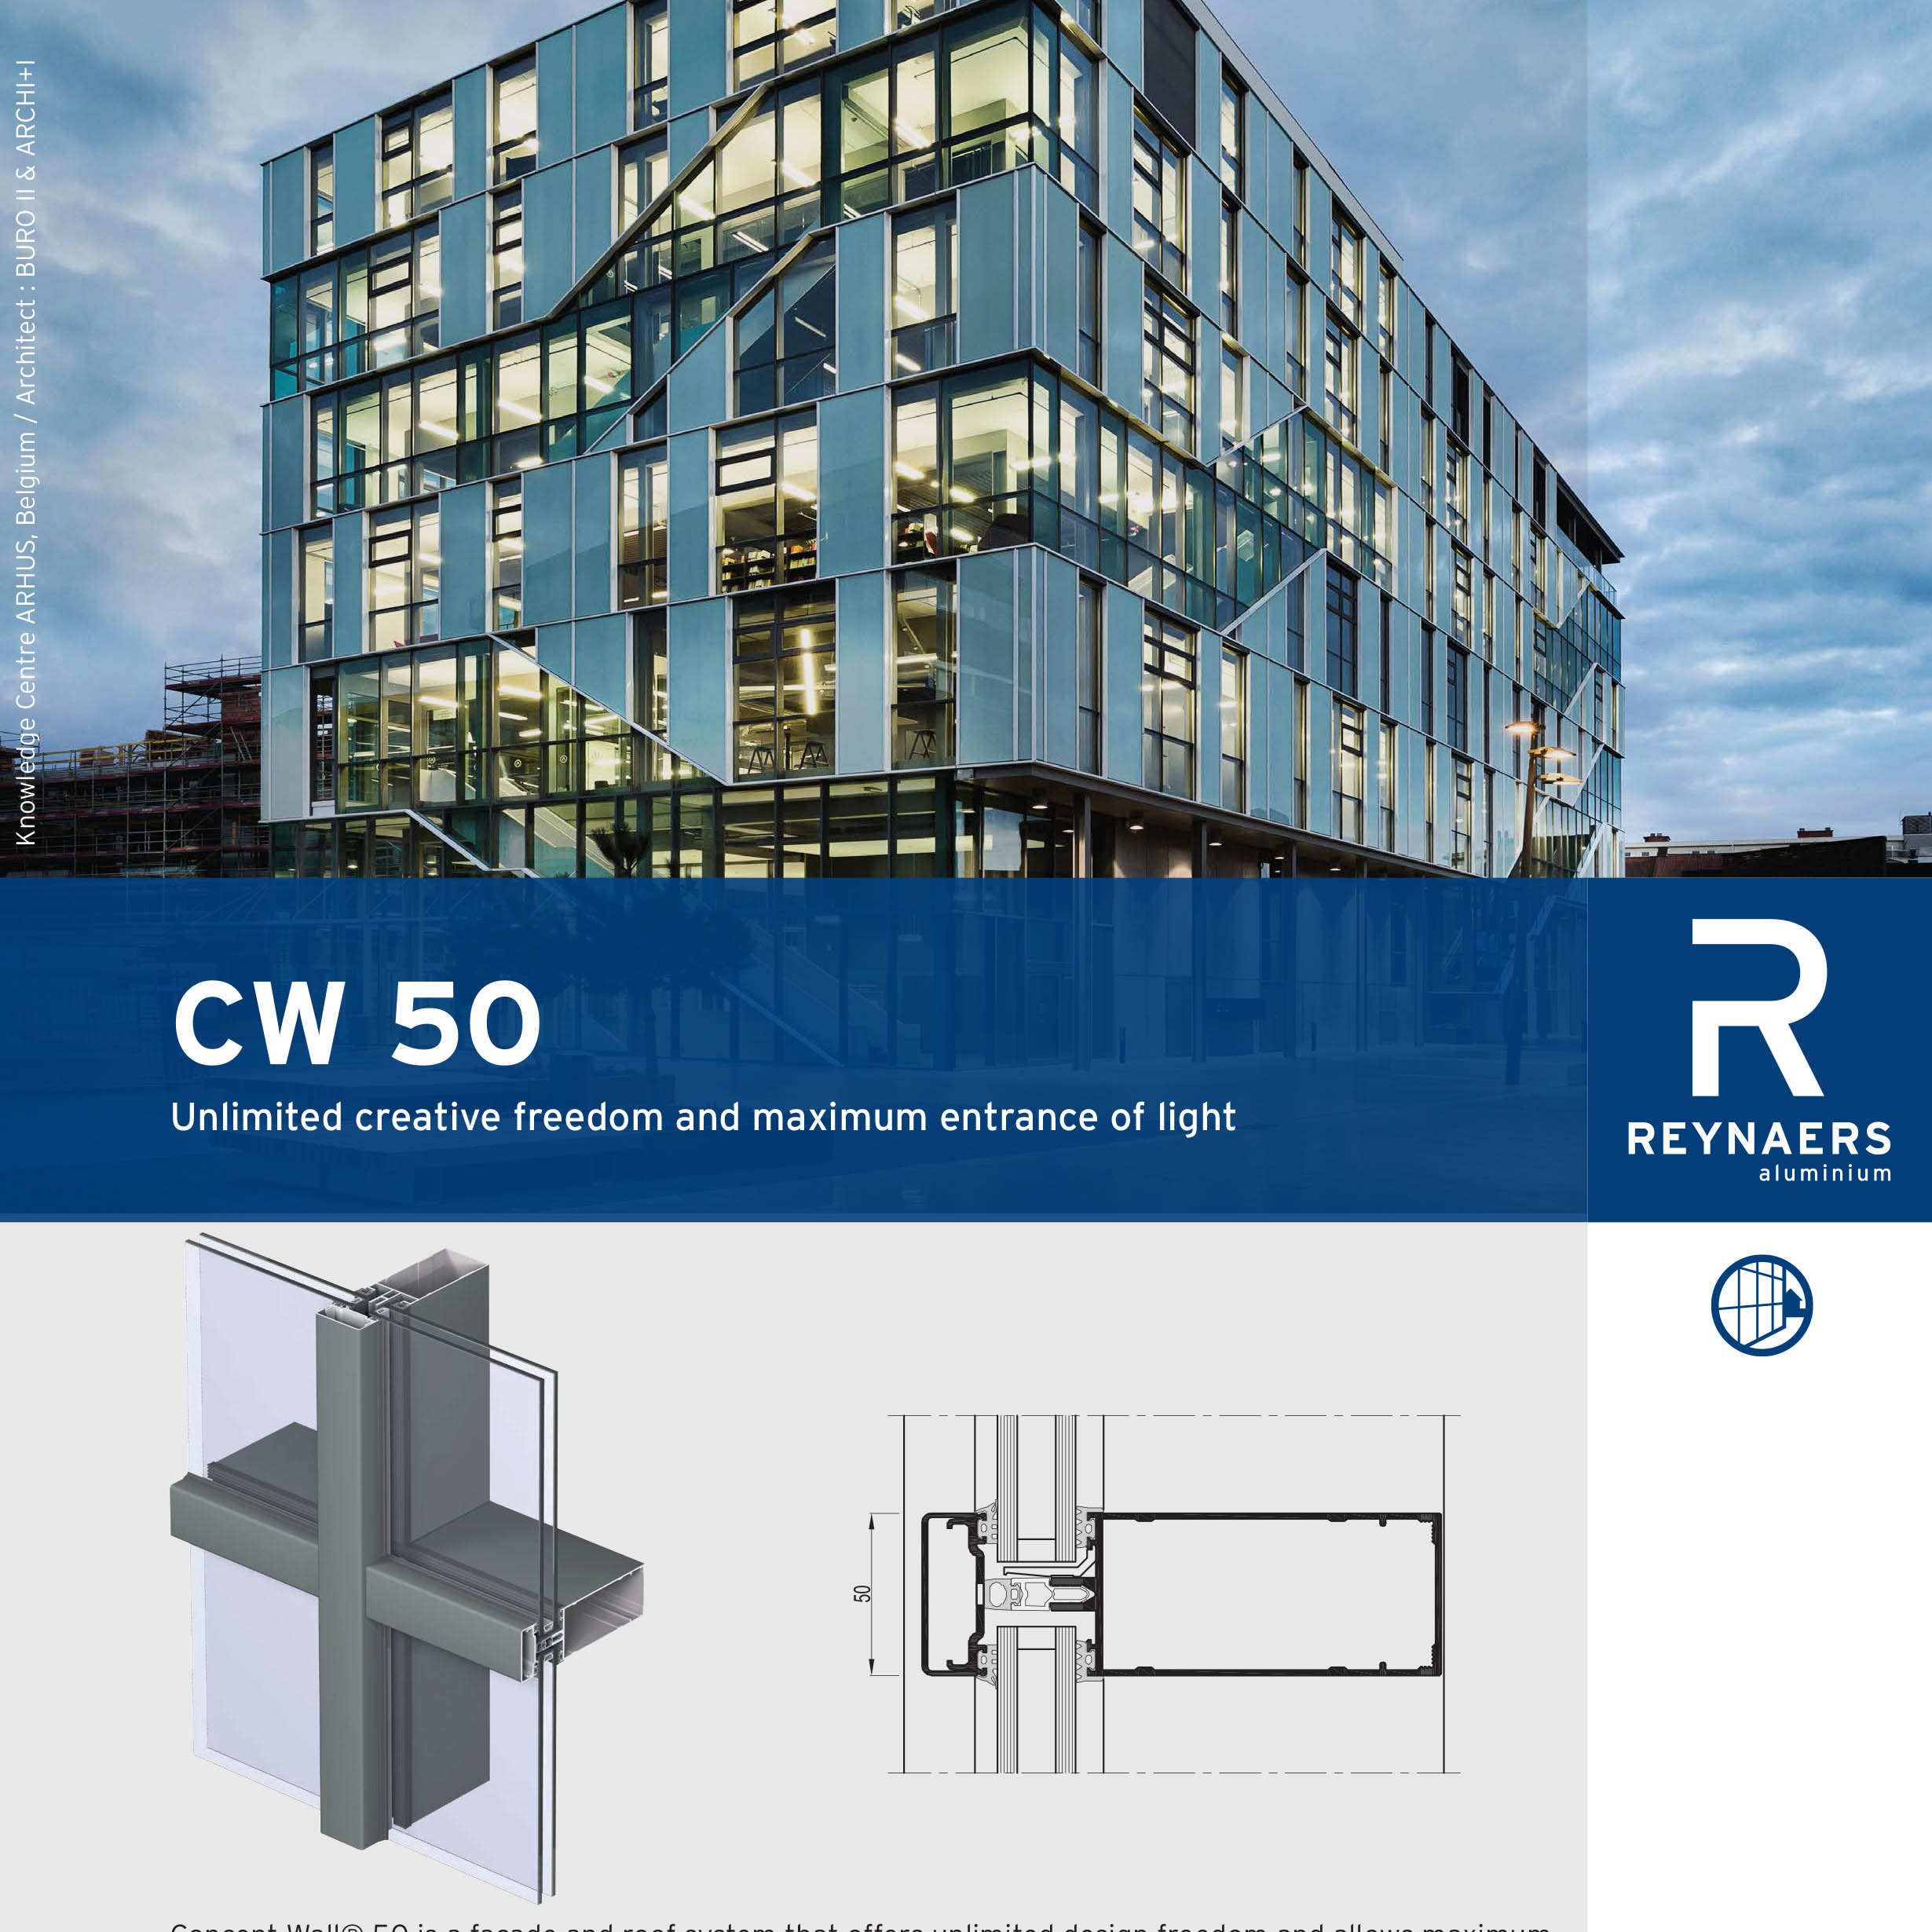 CW 50 -